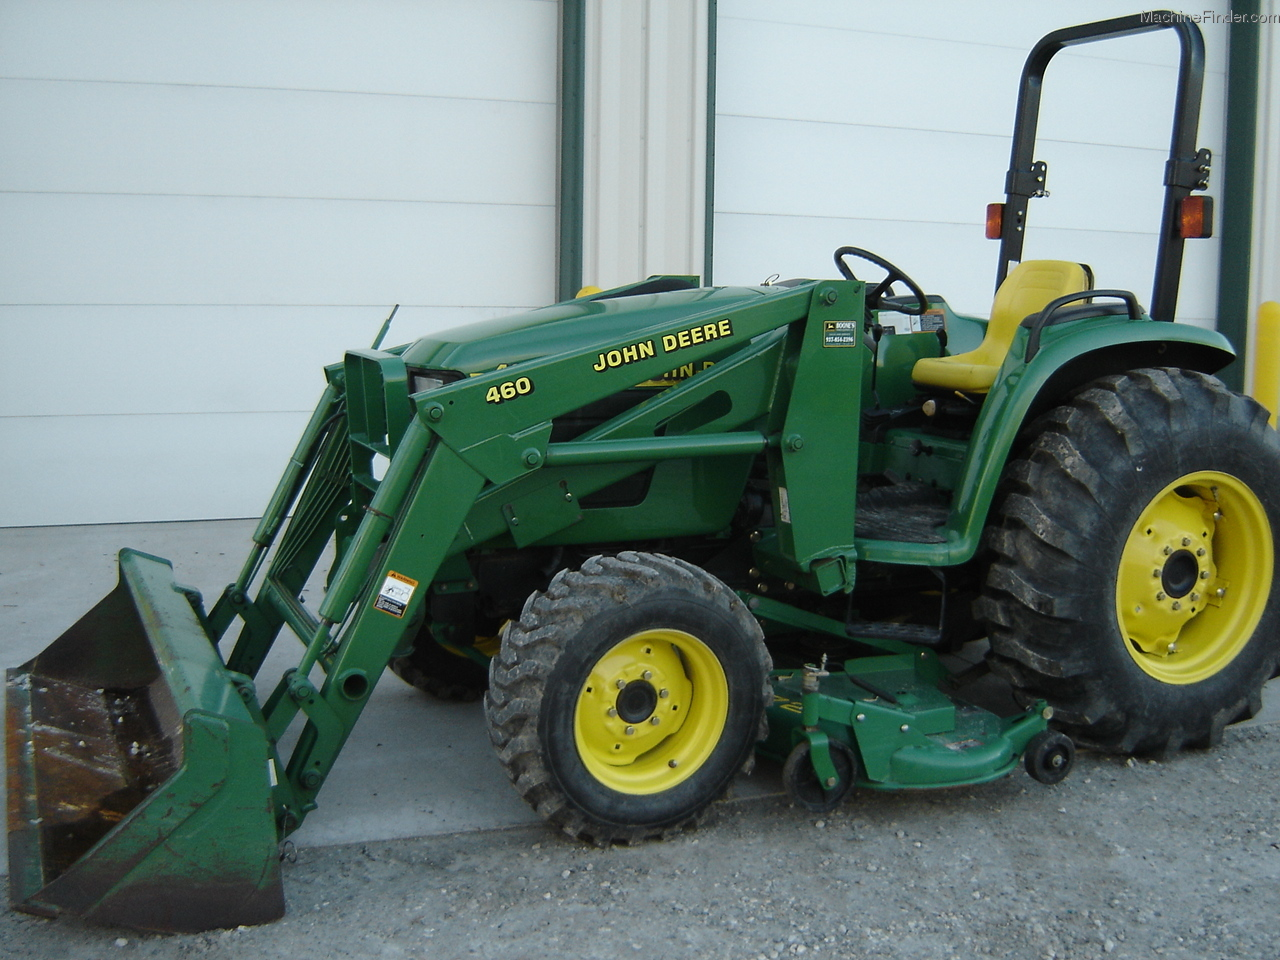 2001 John Deere 4600 Tractors - Compact (1-40hp.) - John ...